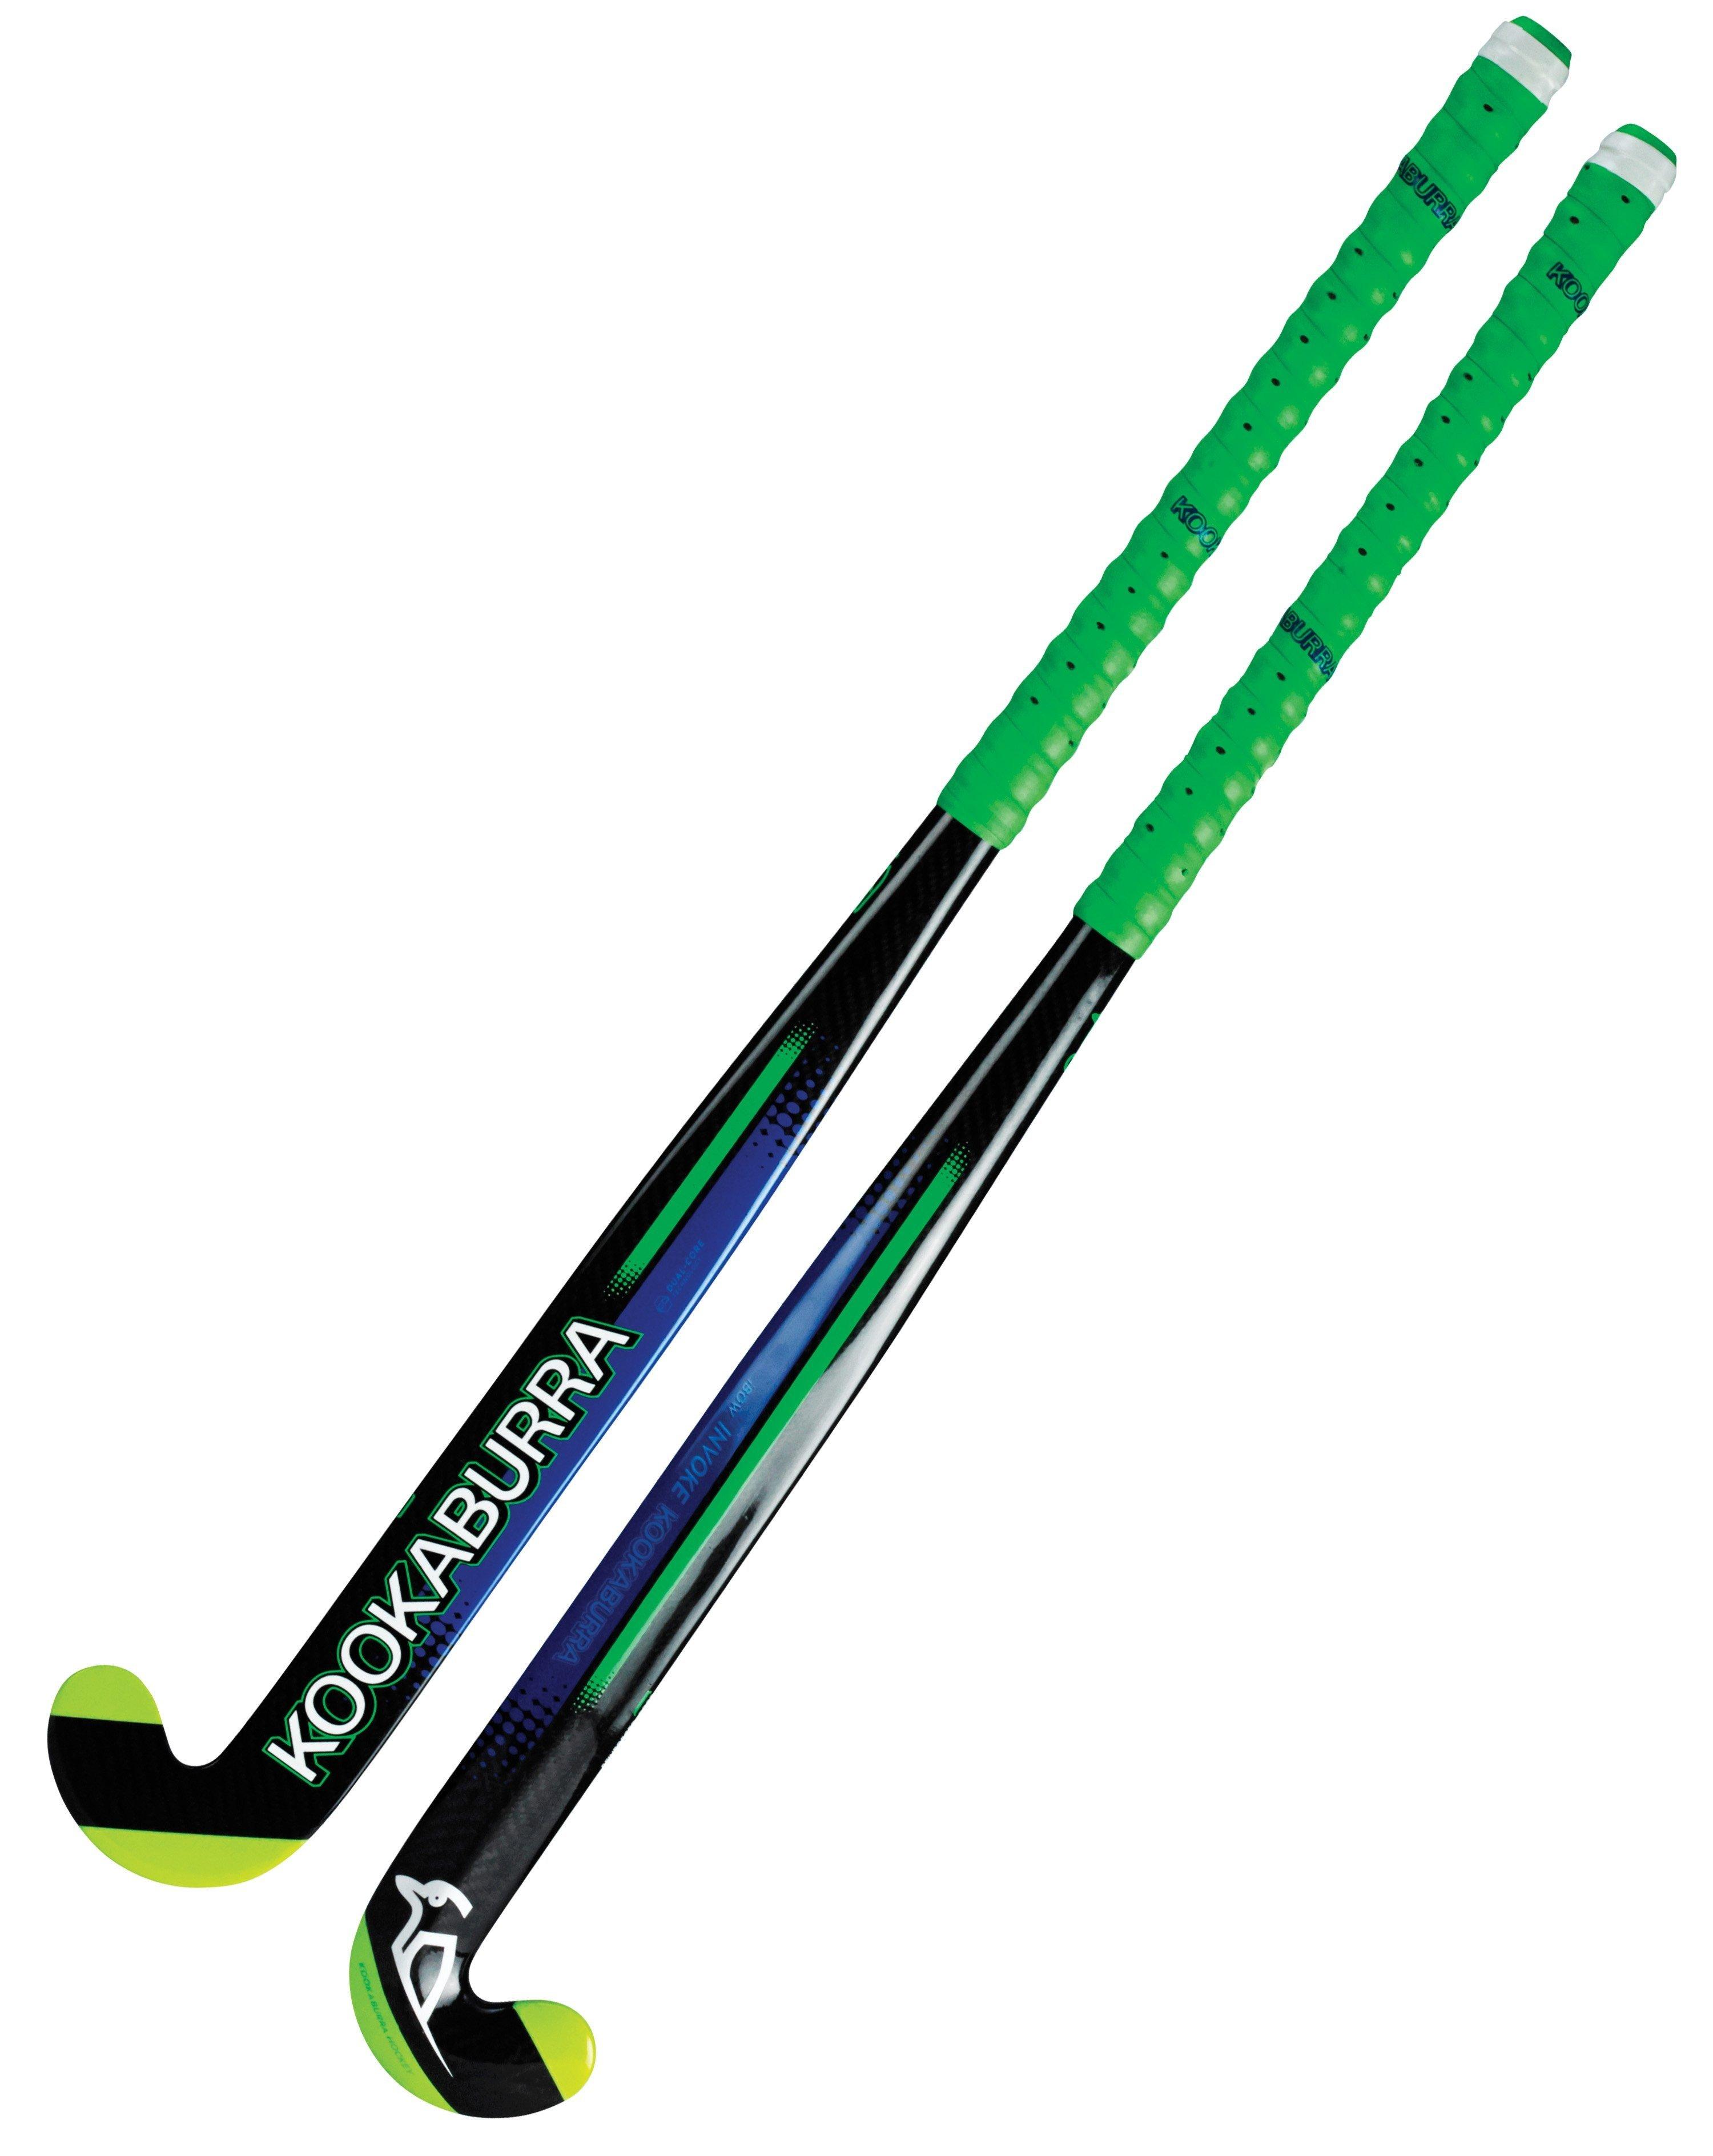 2016/17 Kookaburra Invoke Hockey Stick